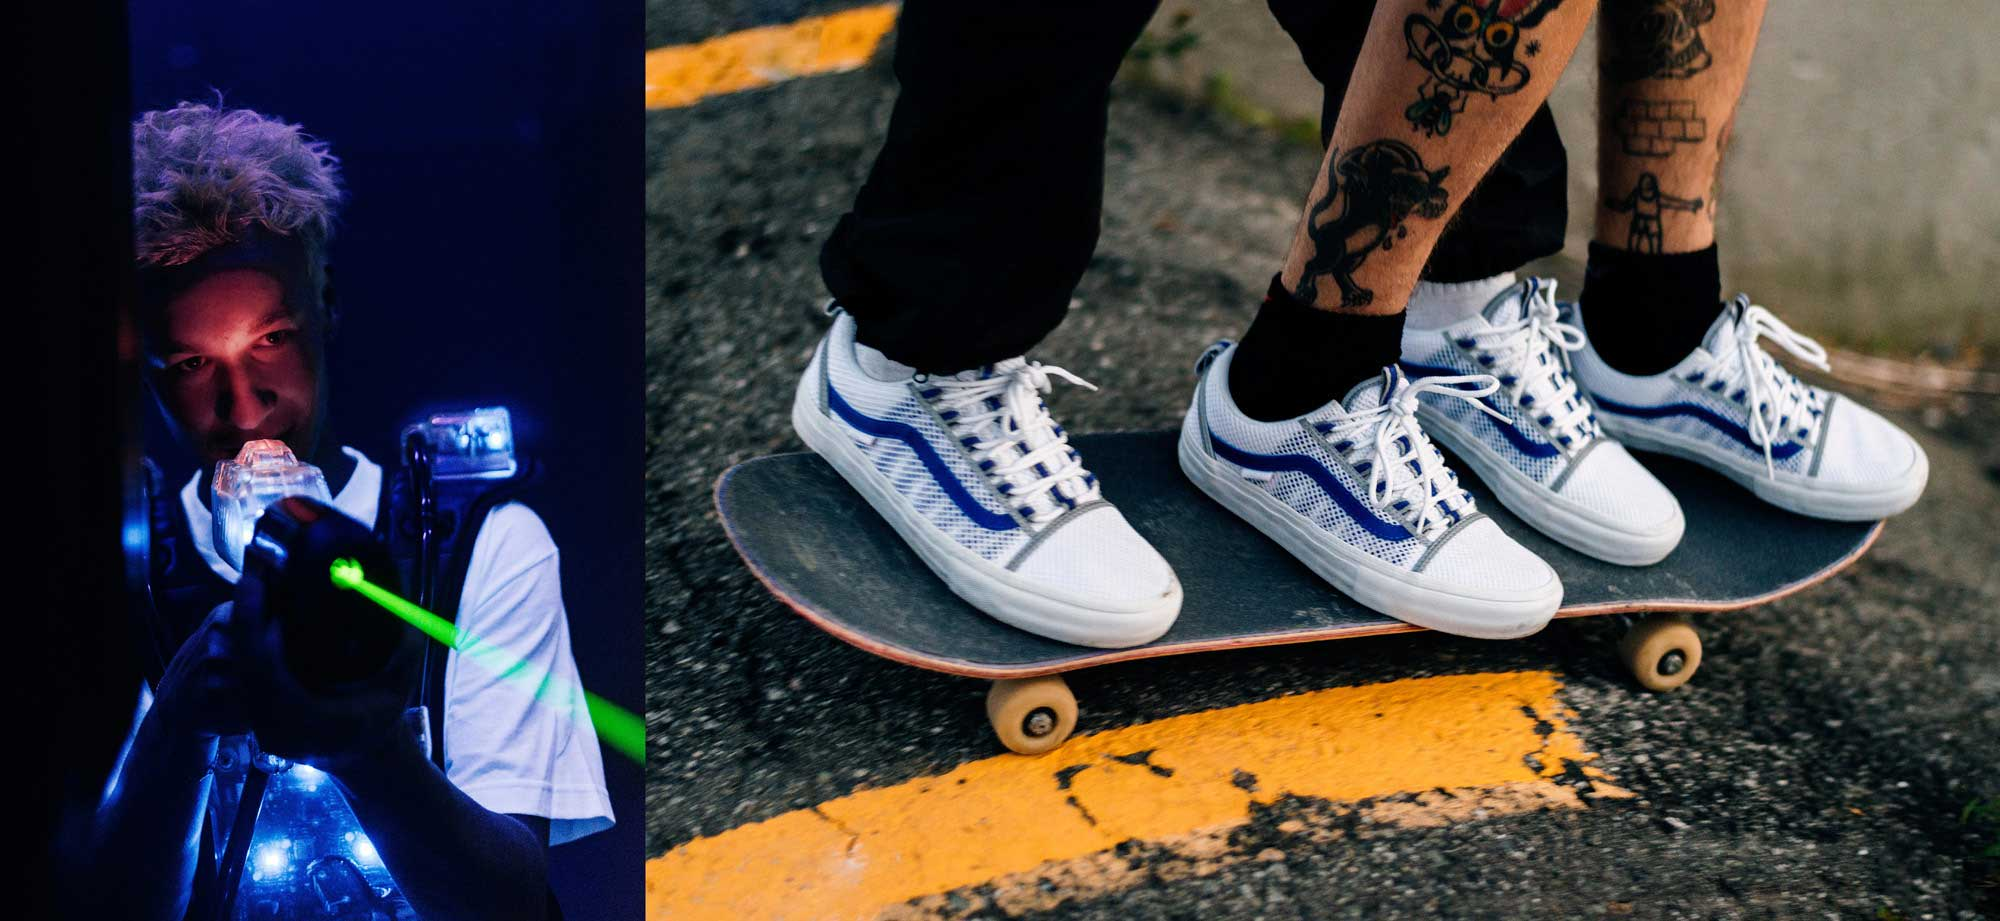 Alltimers x Vans Old Skool Pro Skate